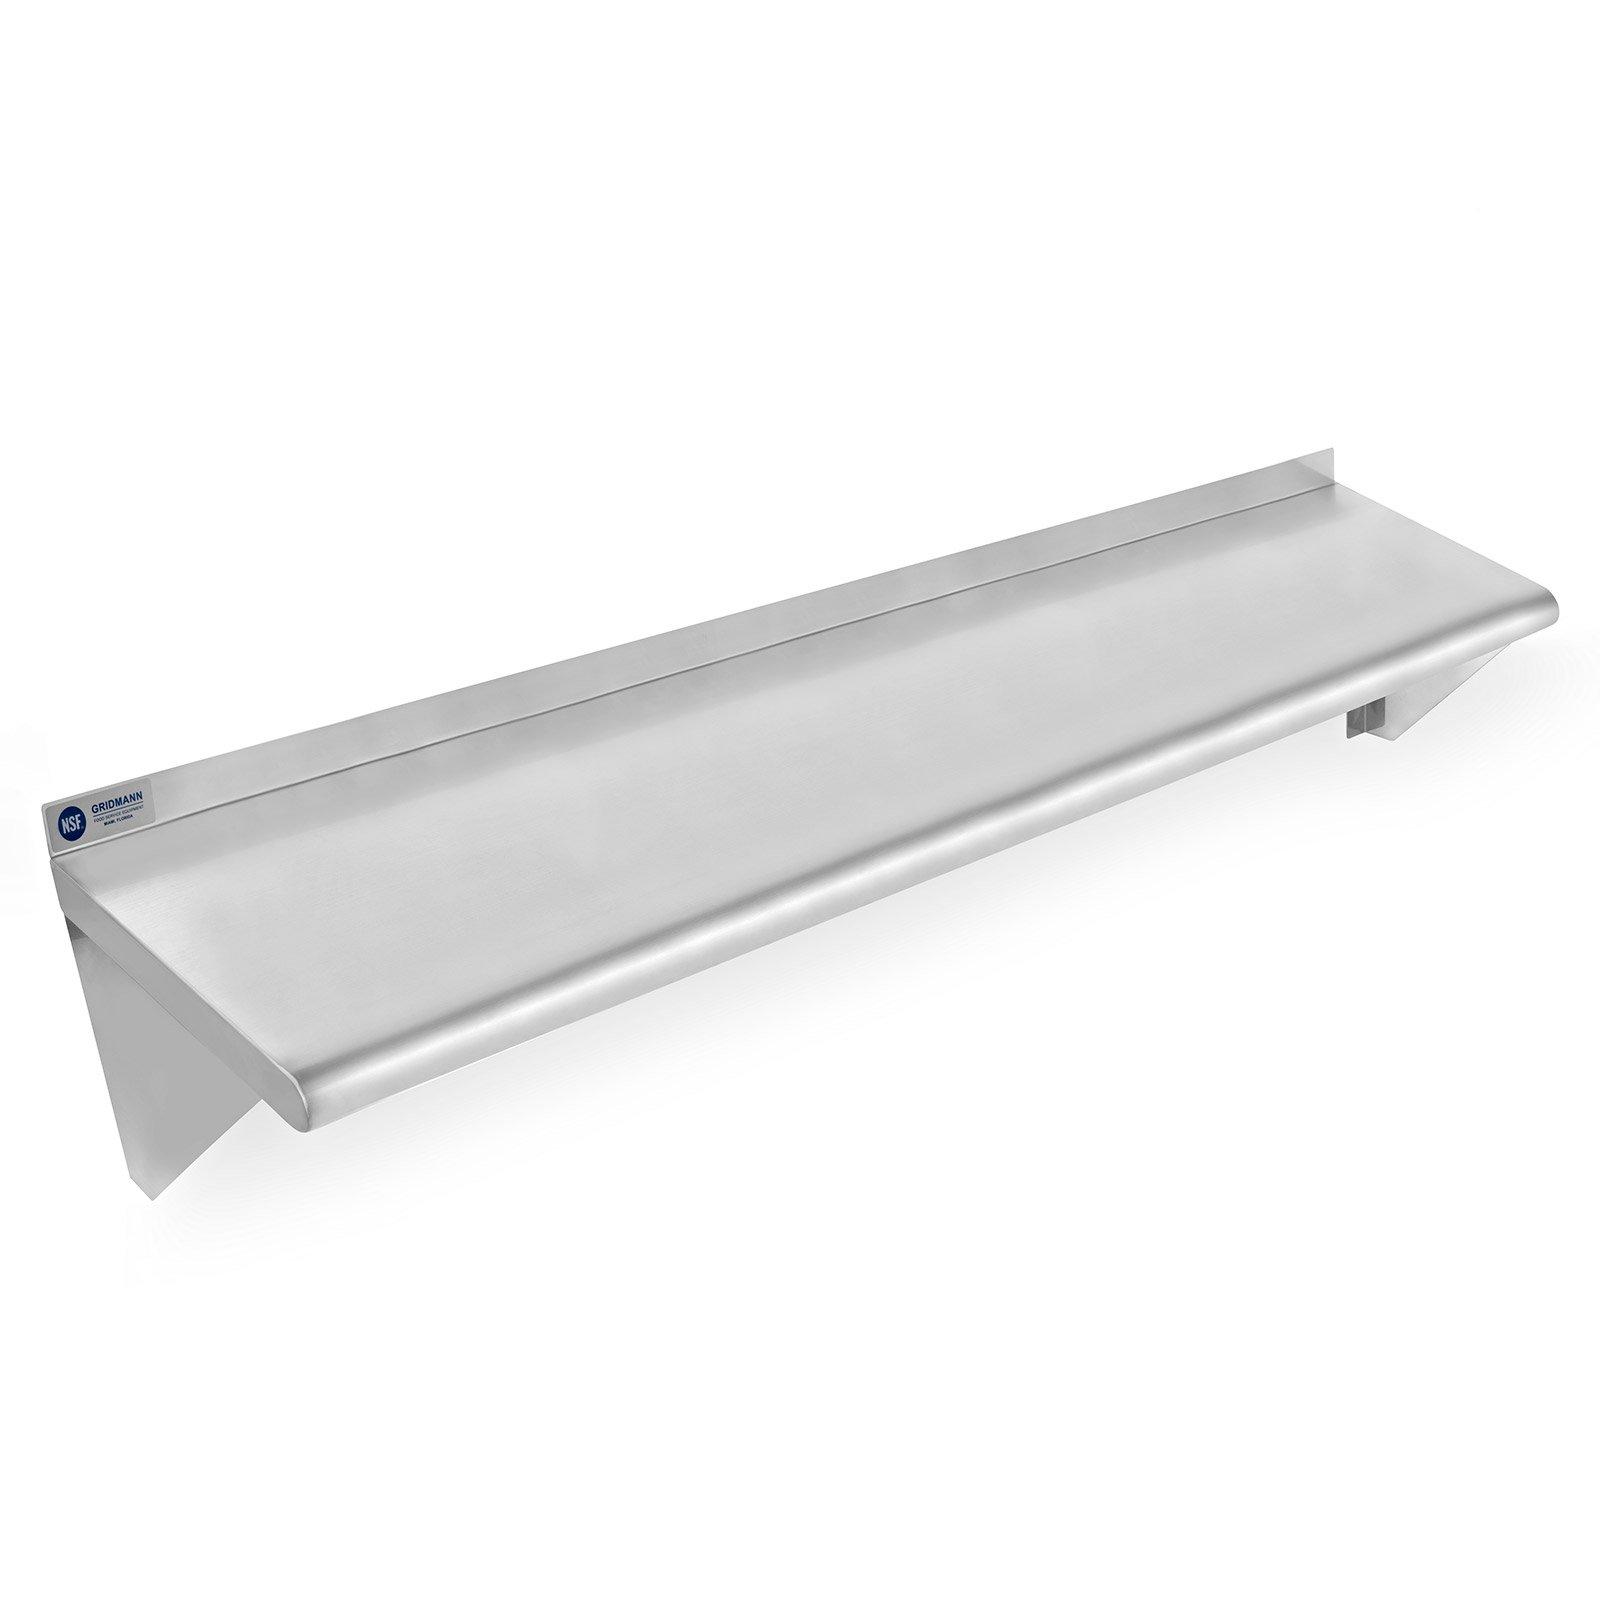 Gridmann NSF Stainless Steel Kitchen Wall Mount Shelf Commercial Restaurant Bar w/ Backsplash - 18'' x 48''